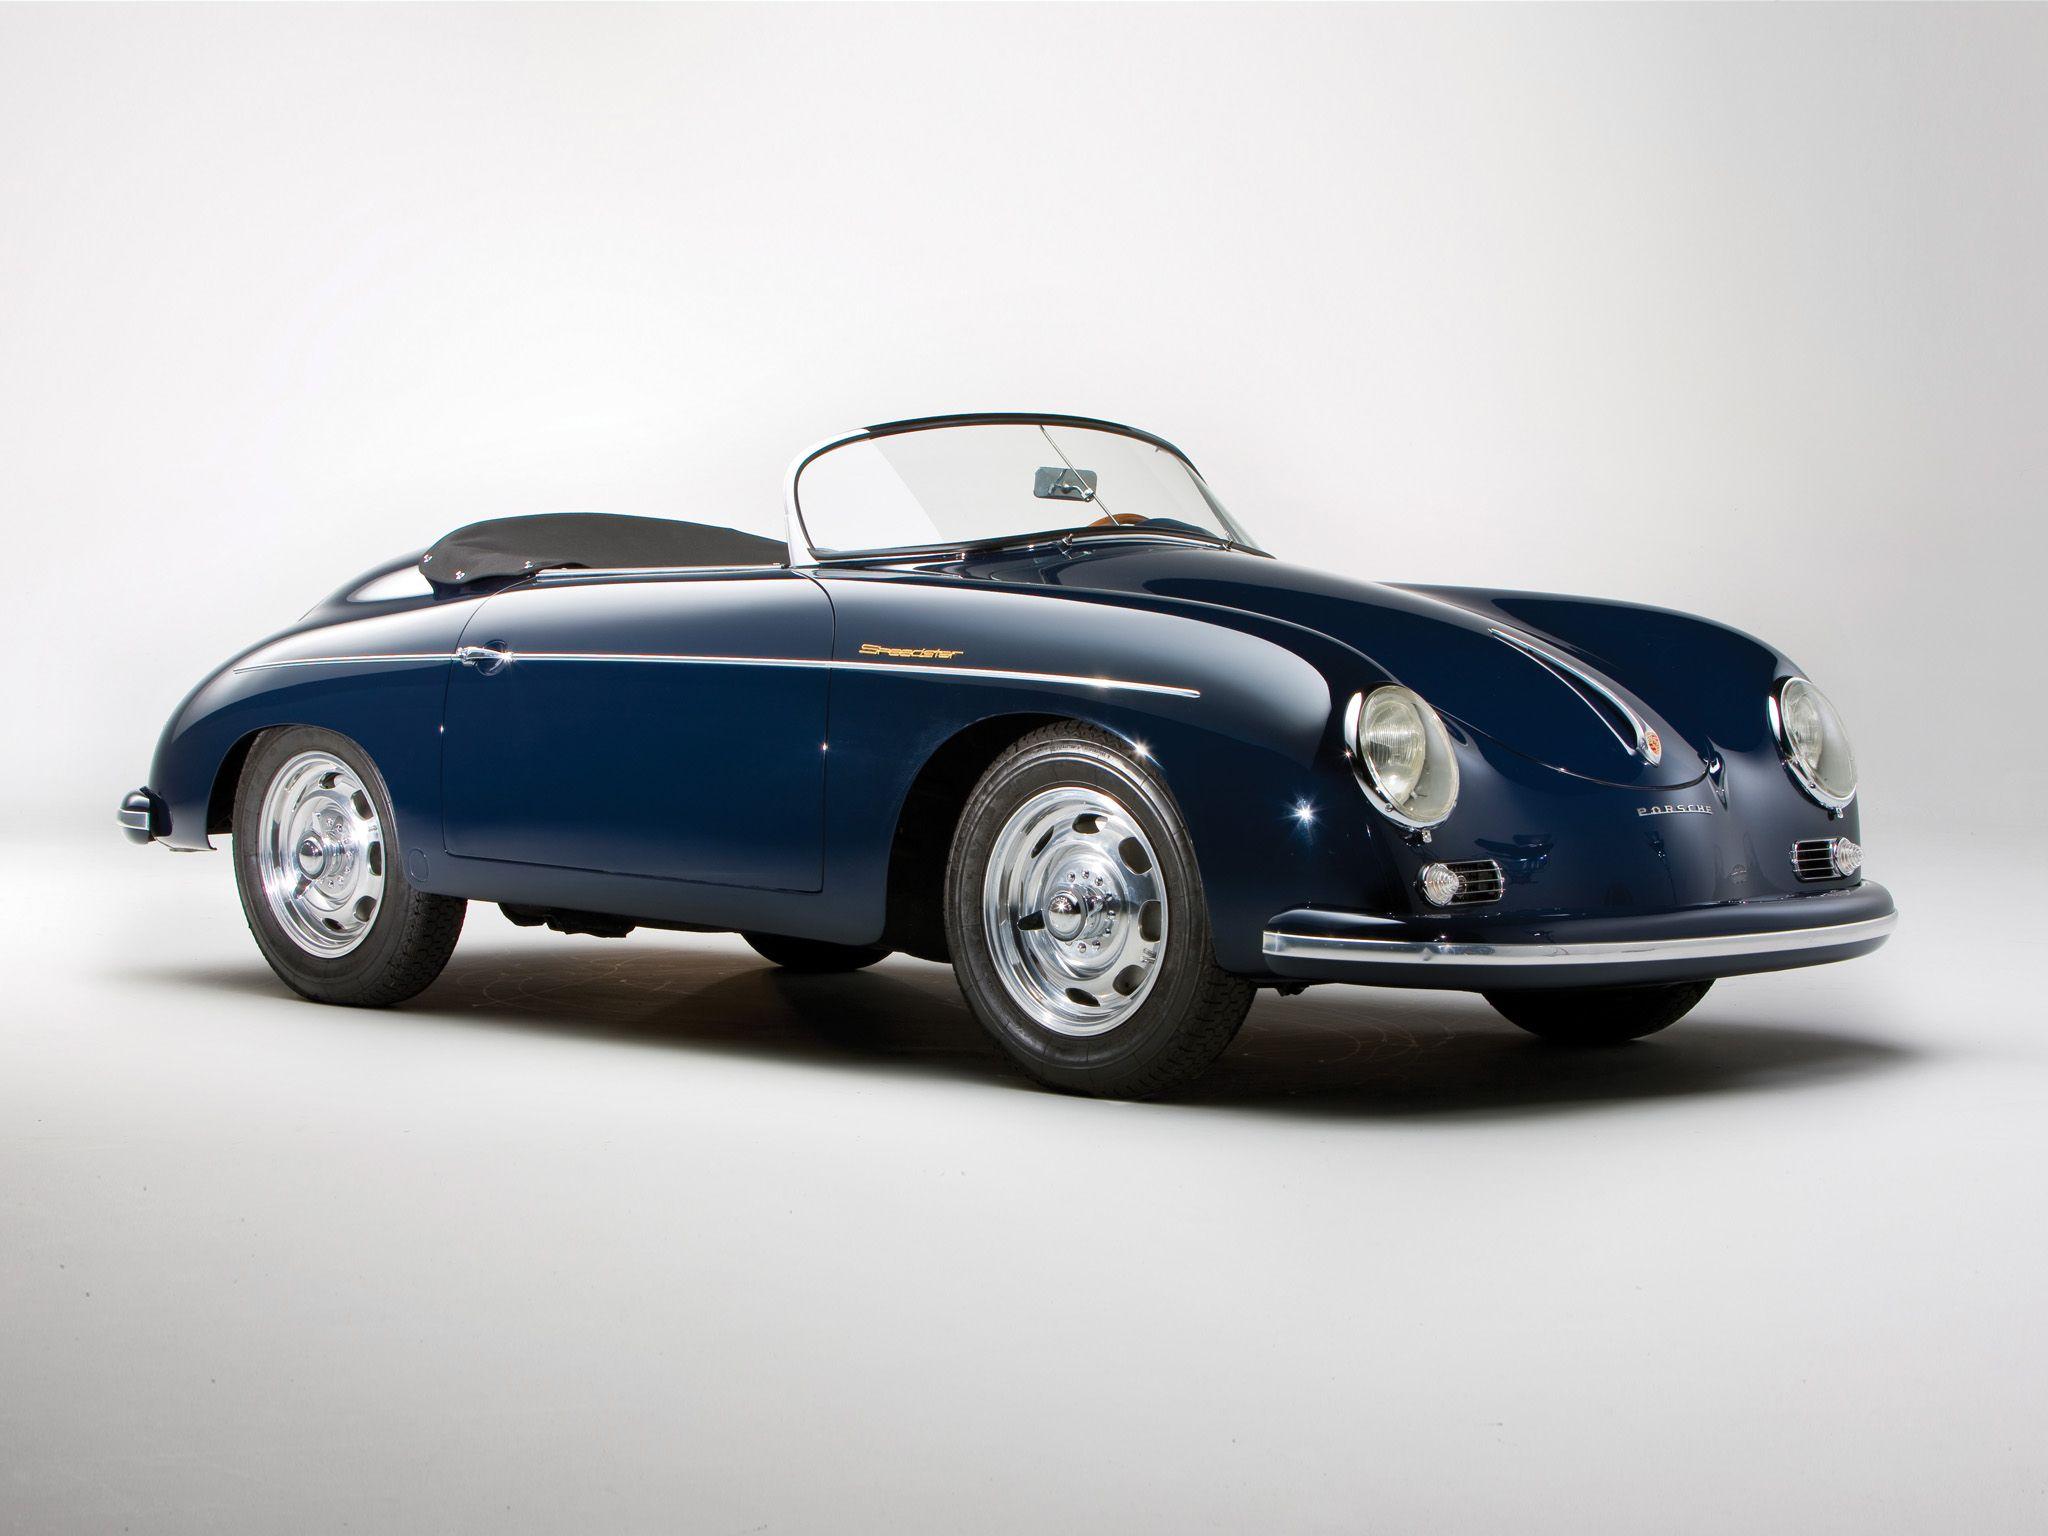 1958 Porsche 356a 1600 Speedster Us Spec T 2 Retro Ff Wallpaper 2048x1536 130578 Wallpaperup Porsche 356a Vintage Porsche Porsche 356 Speedster